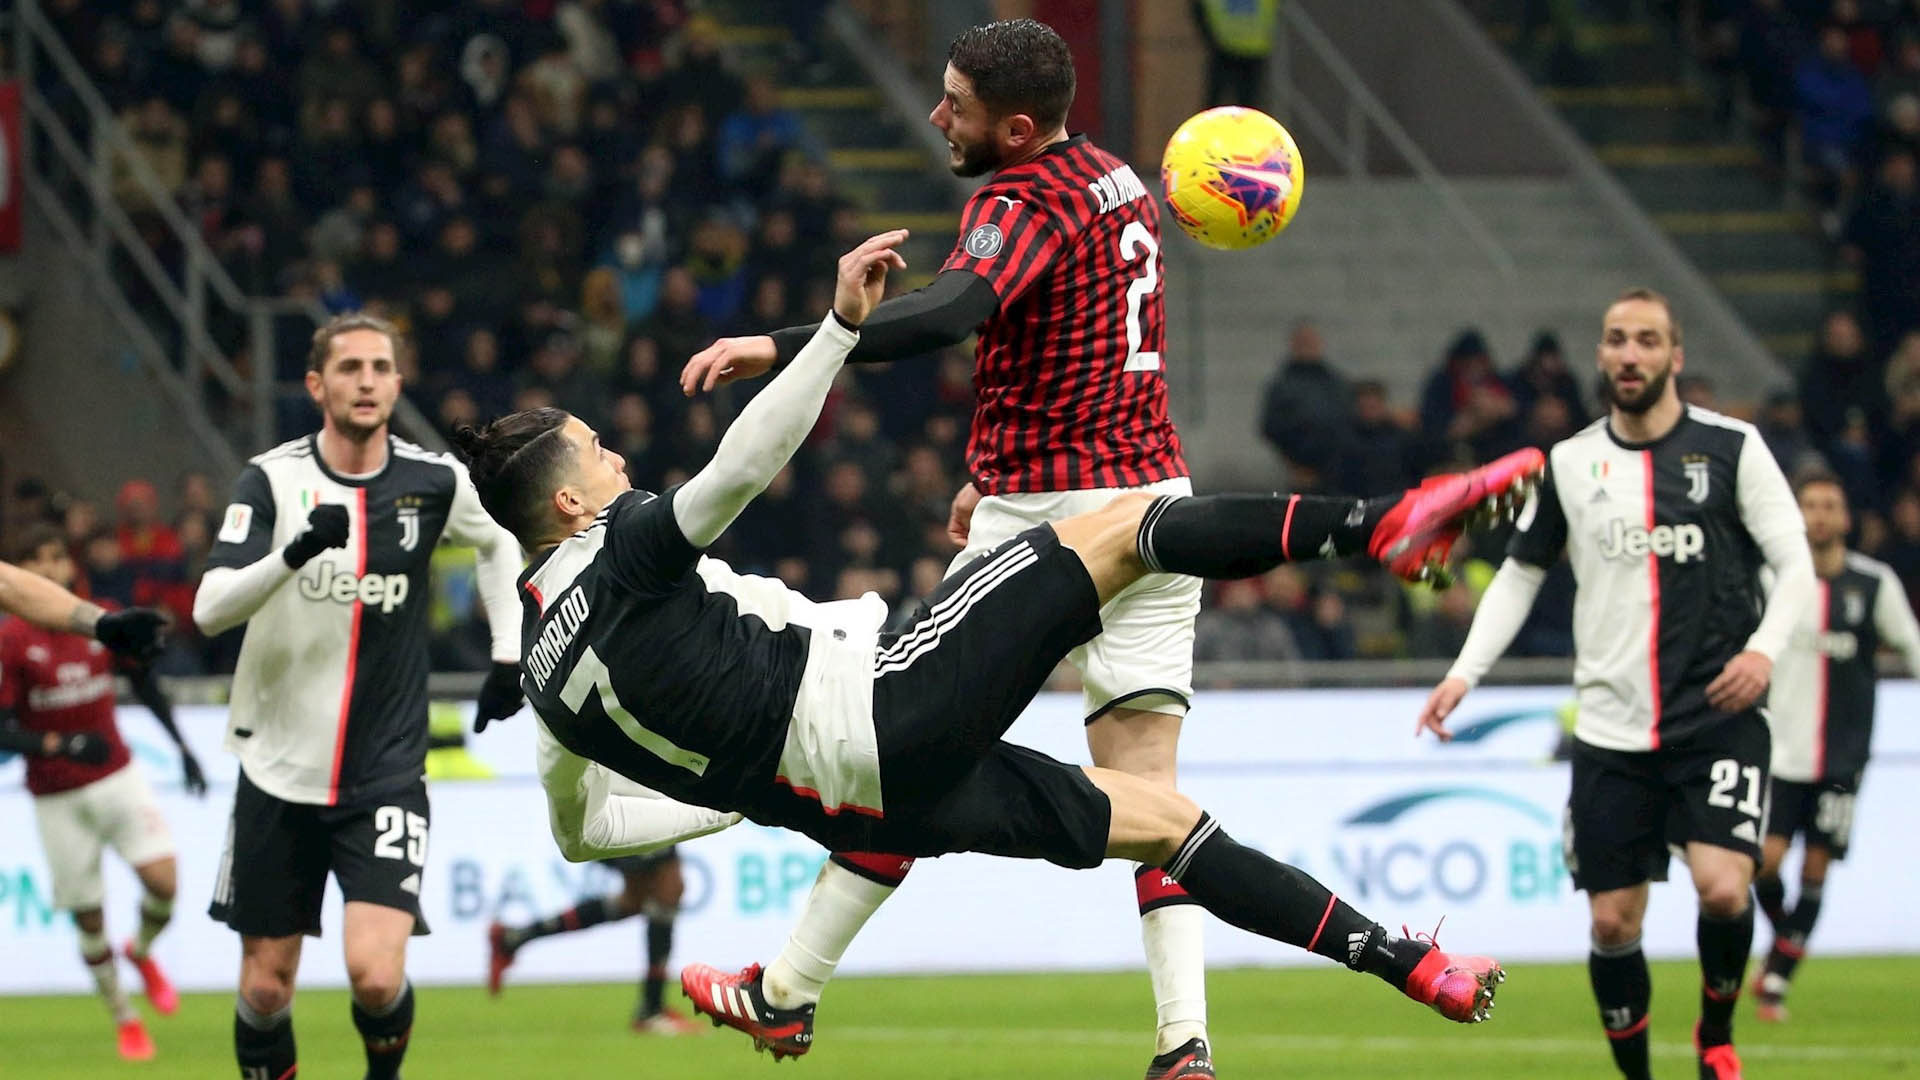 Juventus Cristiano Ronaldo futbol partido AC Milán